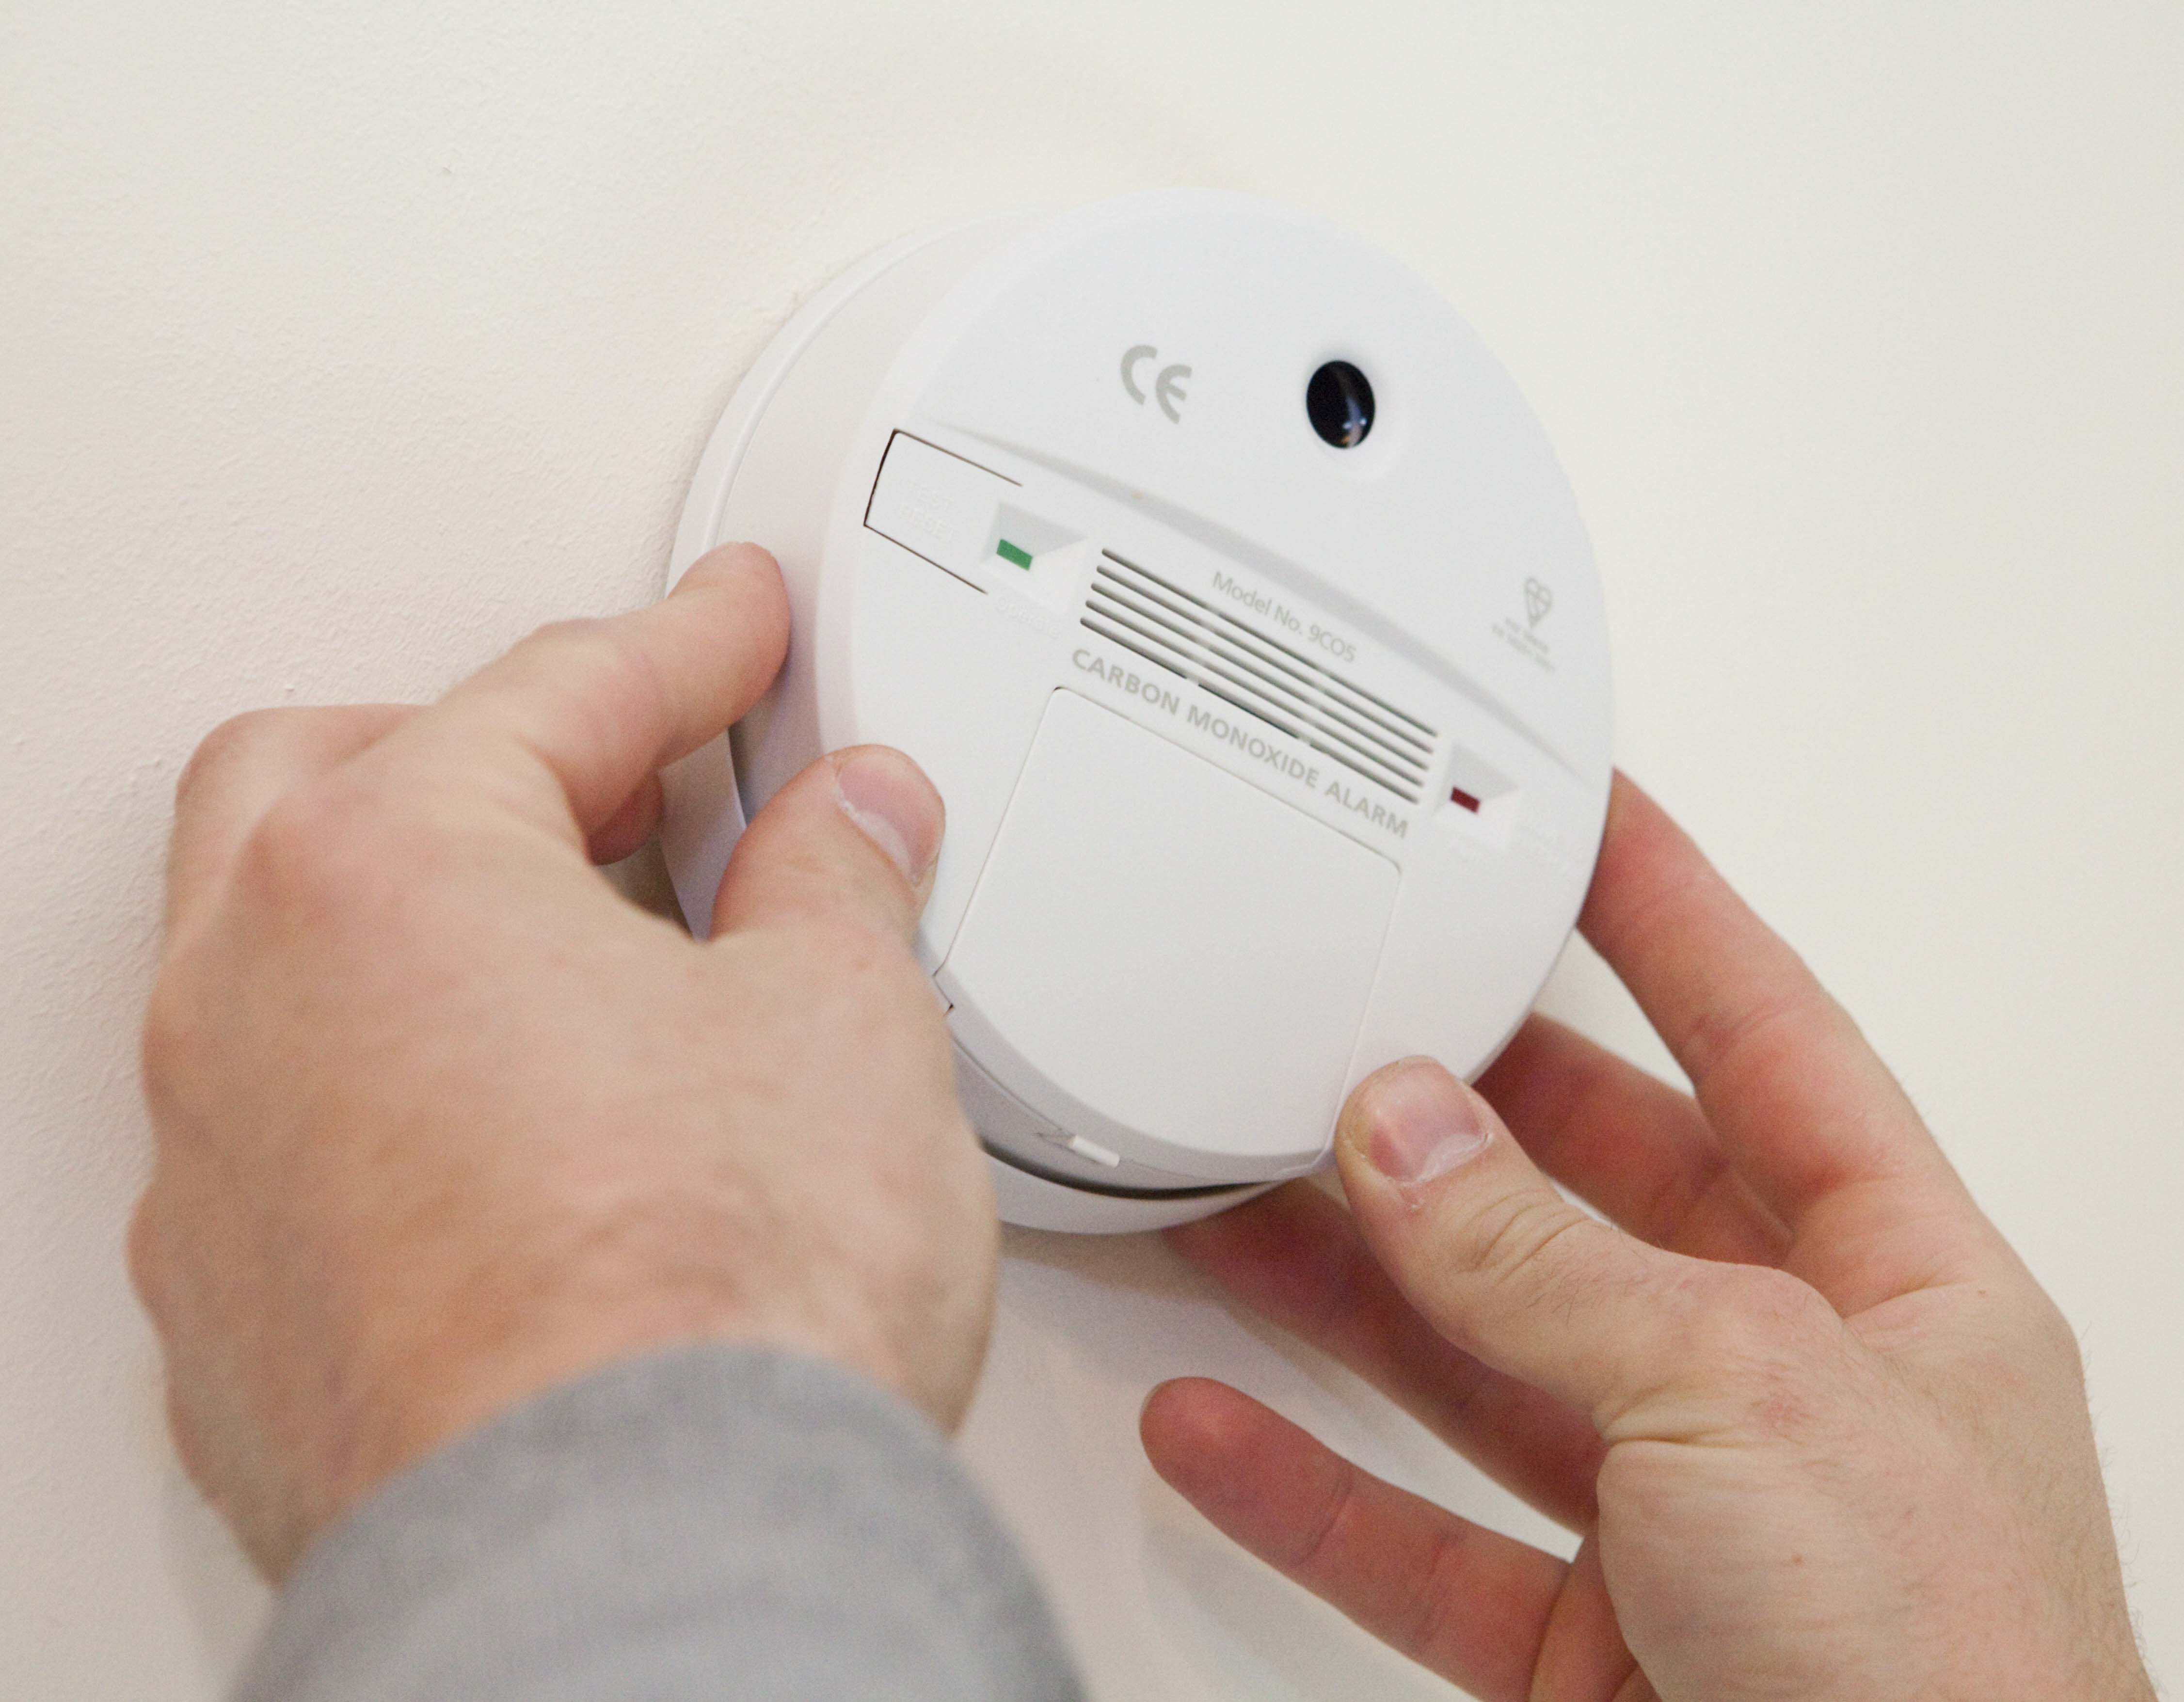 how to get a free carbon monoxide detector